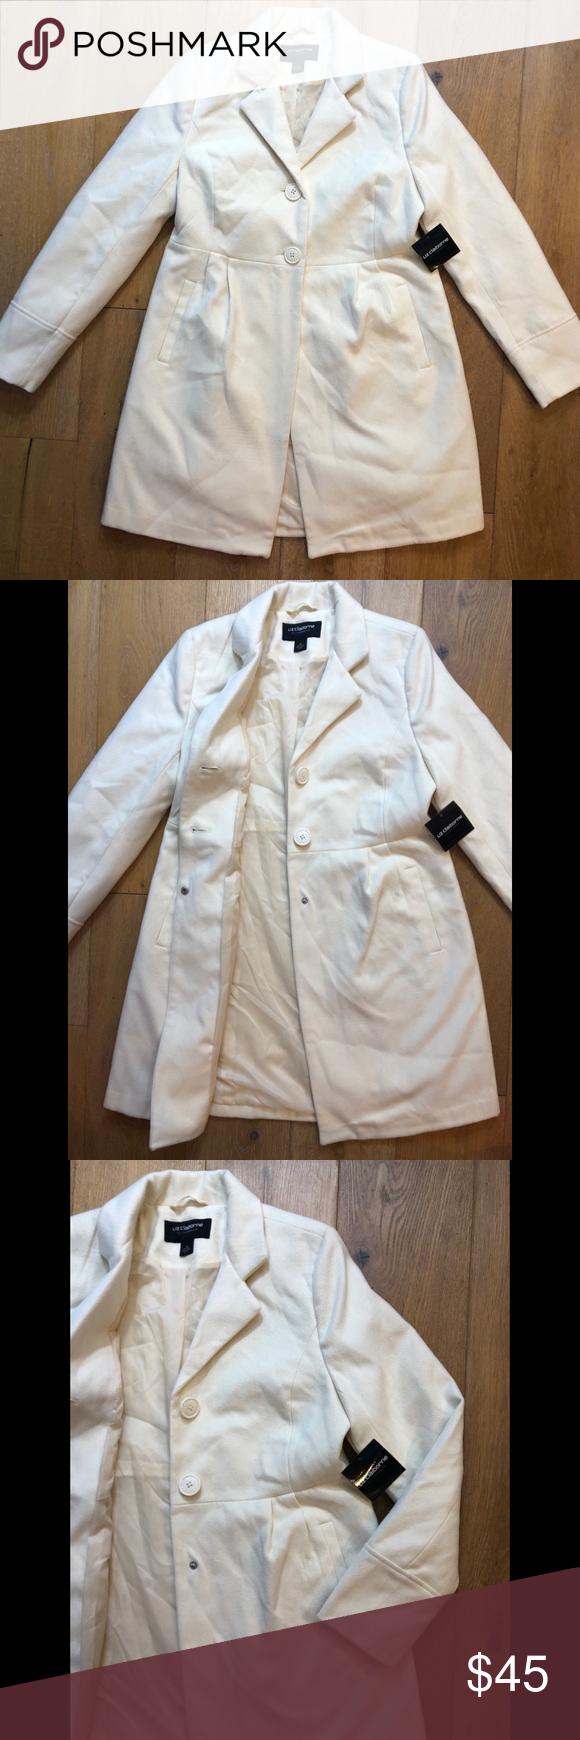 Liz Claiborne Outerwear Off White Peacoat M Liz Claiborne Outerwear Claiborne [ 1740 x 580 Pixel ]